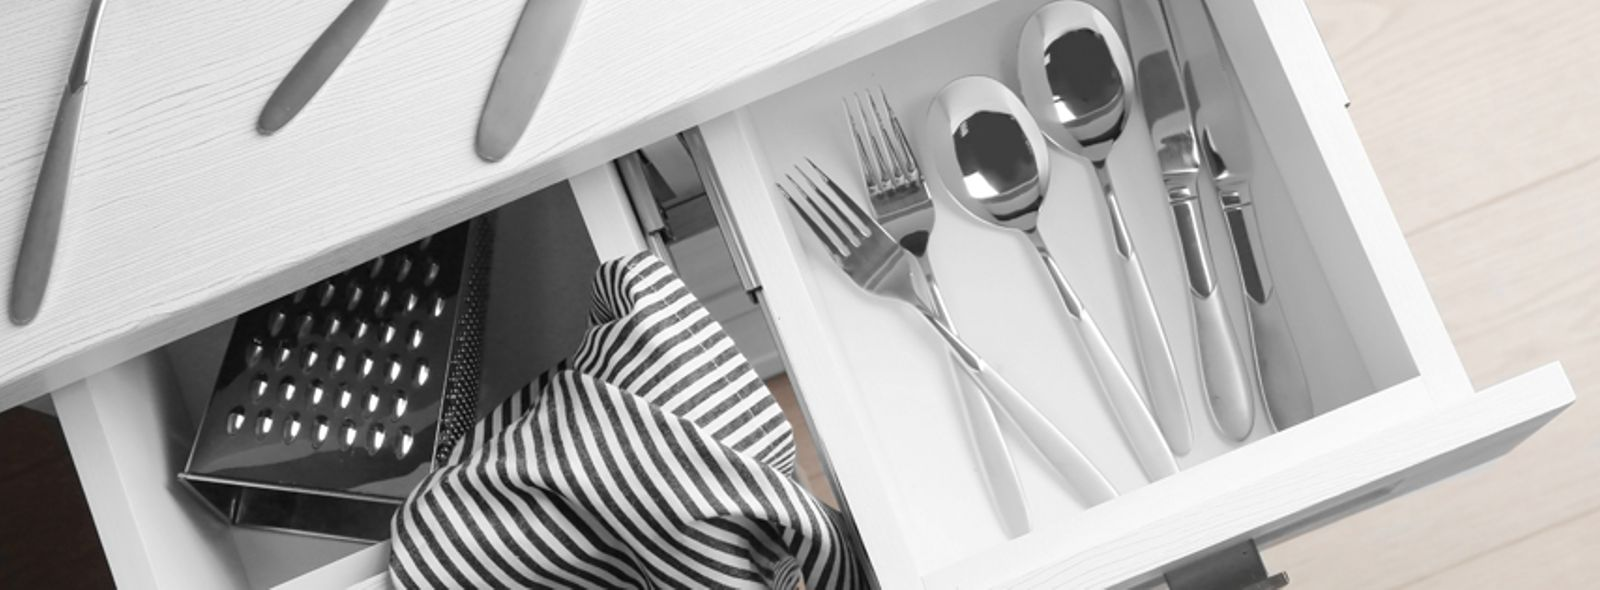 Divisori cassetti cucina divisori per cassetti cucina accessori cassetti e cestoni rovere - Divisori per cassetti cucina ...